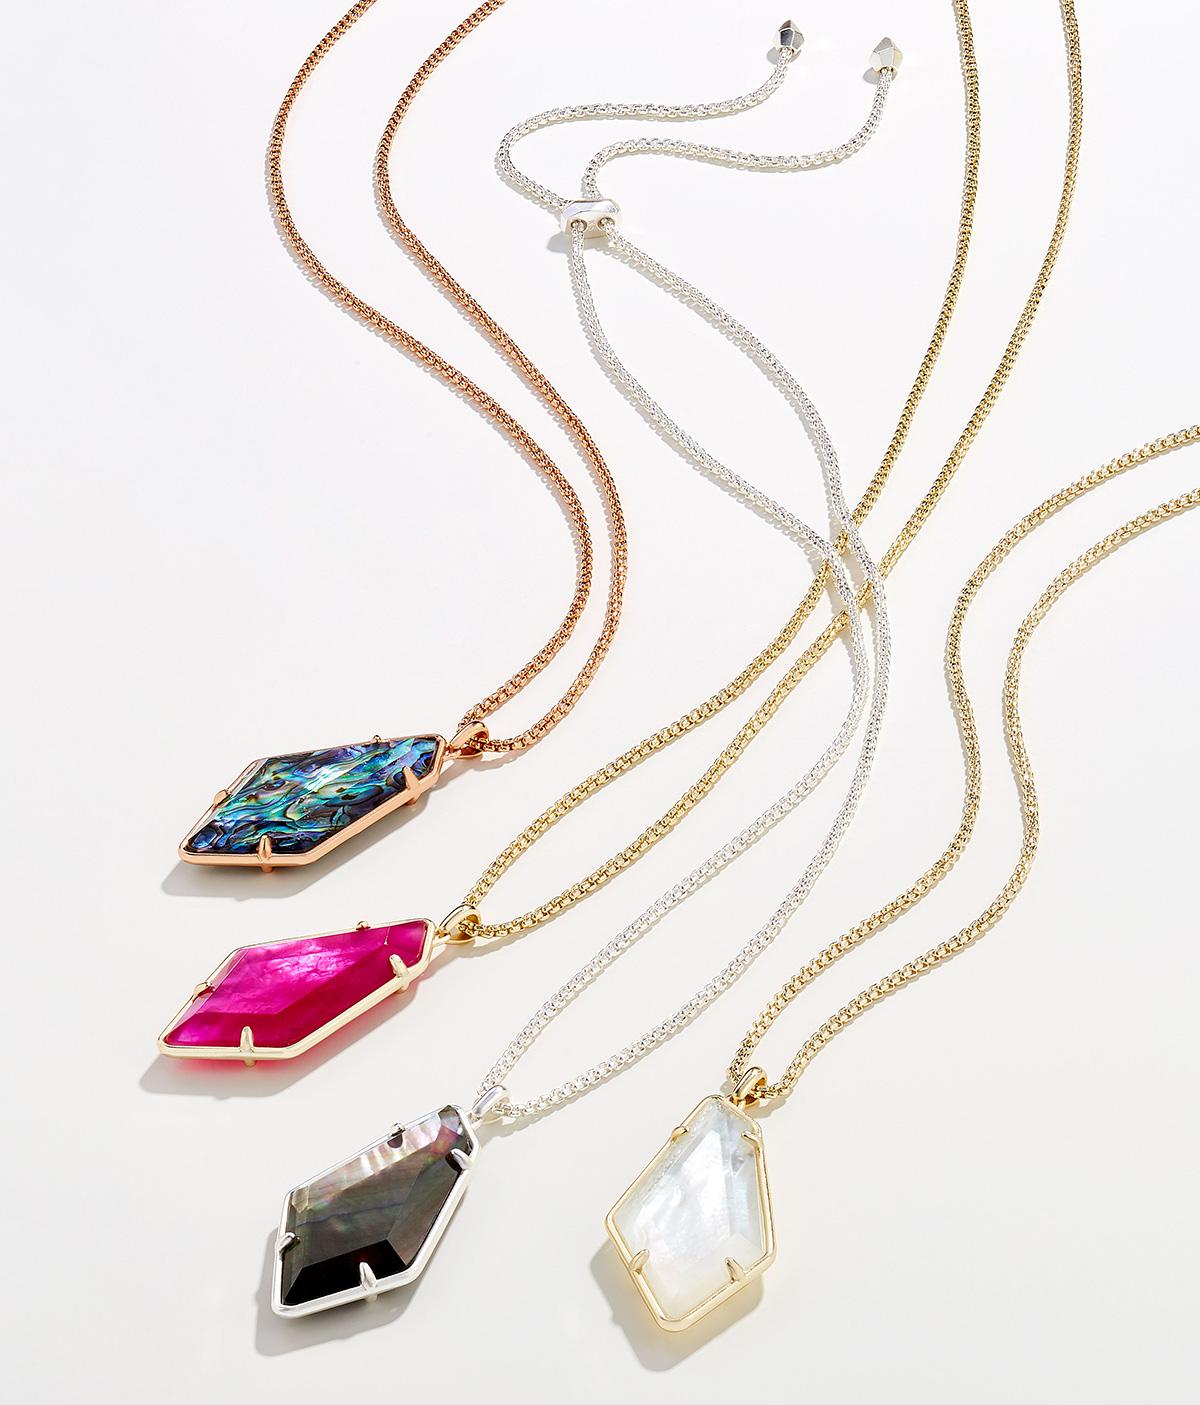 21b6adce6e12 Kendra Scott | Shop Jewelry for Women, Home Décor and Beauty